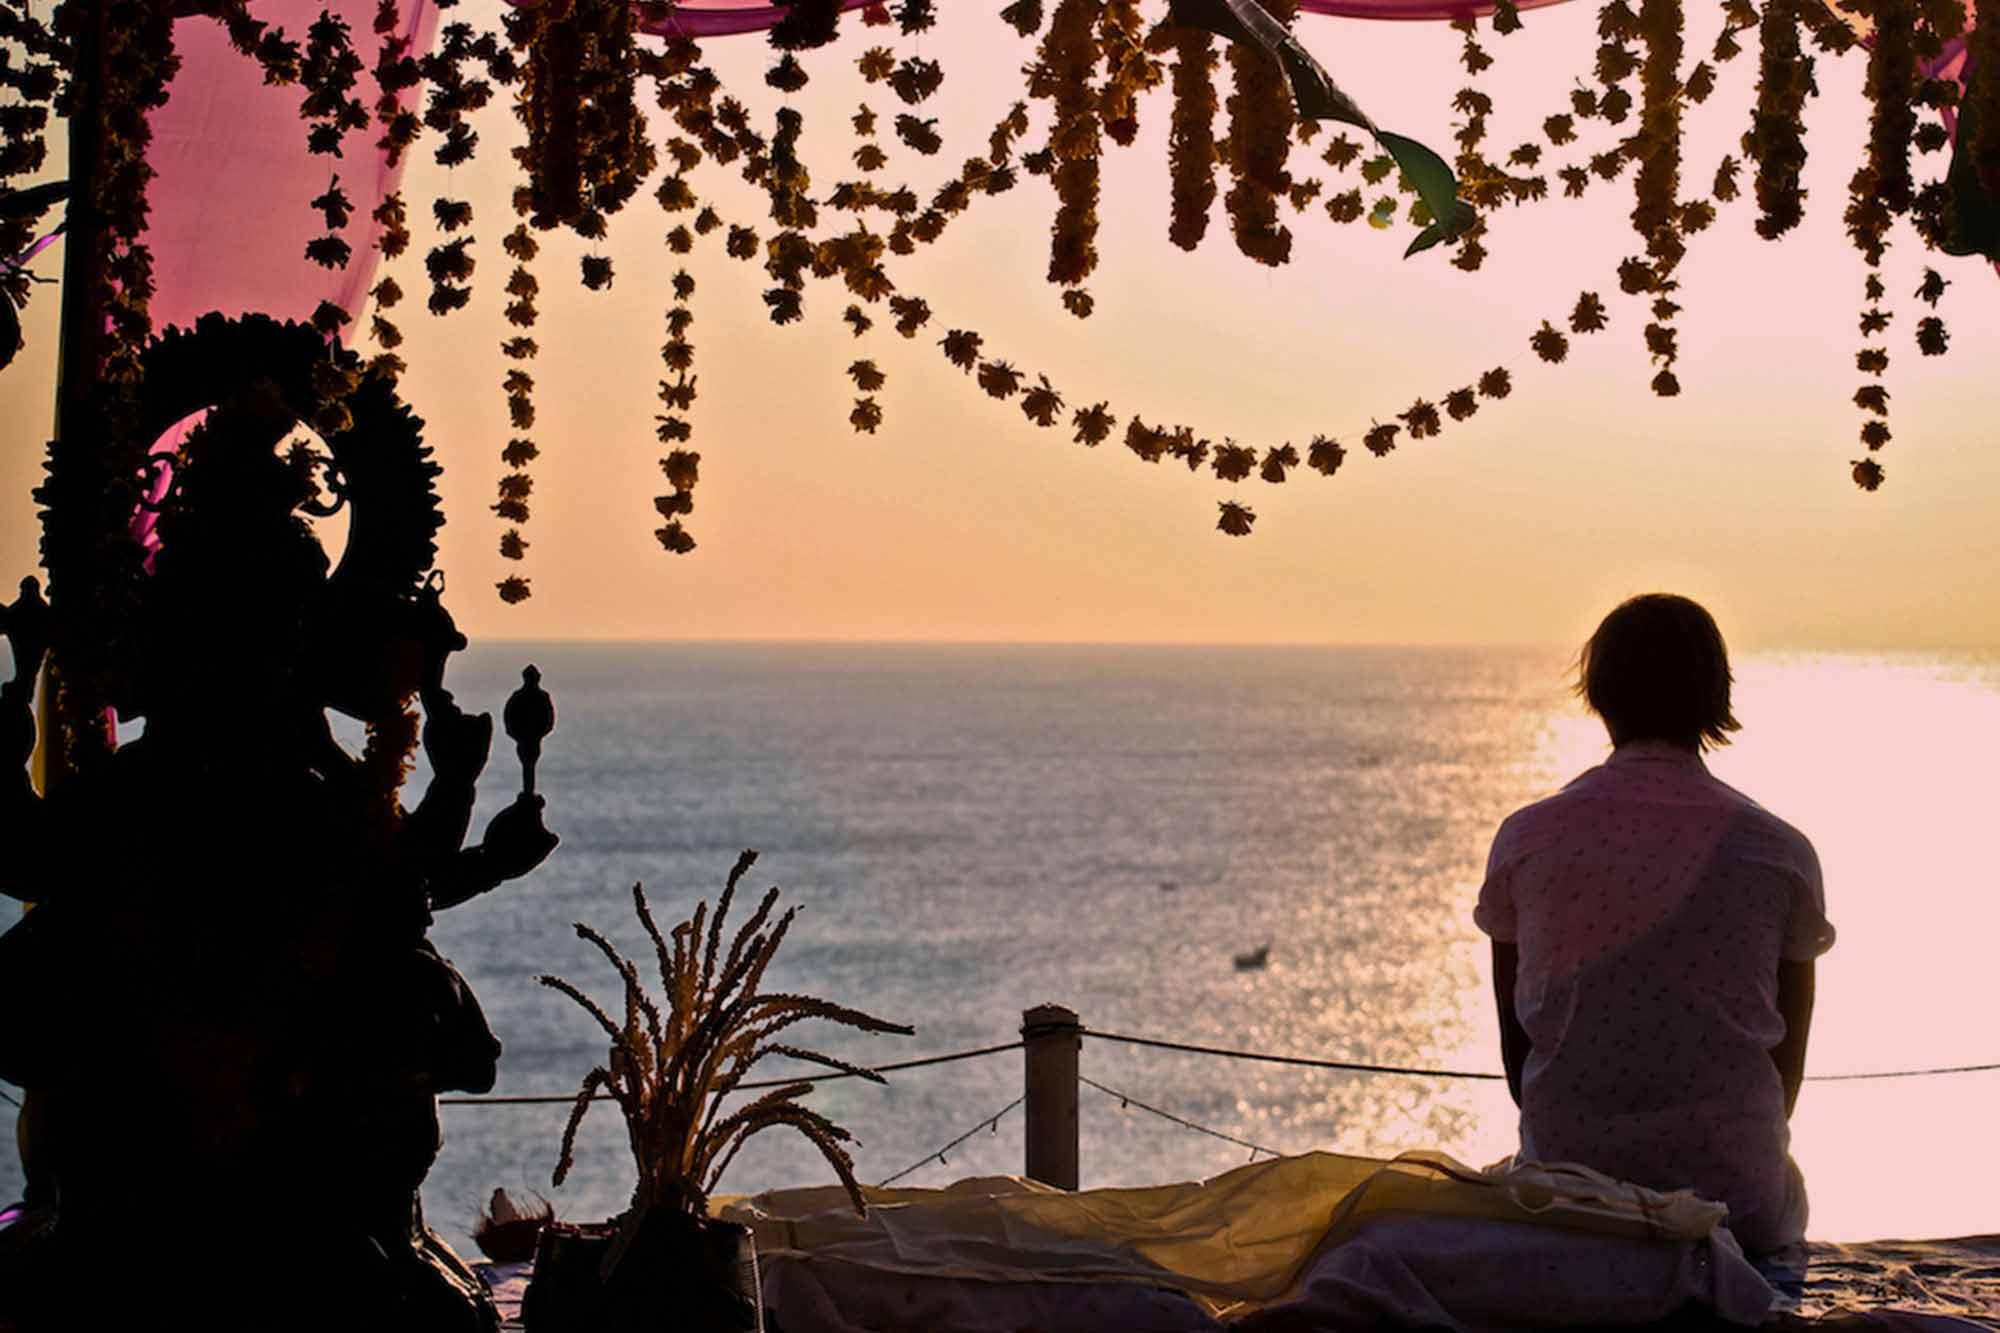 https://www.soulandsurf.com/wp-content/uploads/2021/09/Retreatsindia-images-Vow-Renewal-in-Kerala-Garden.jpg